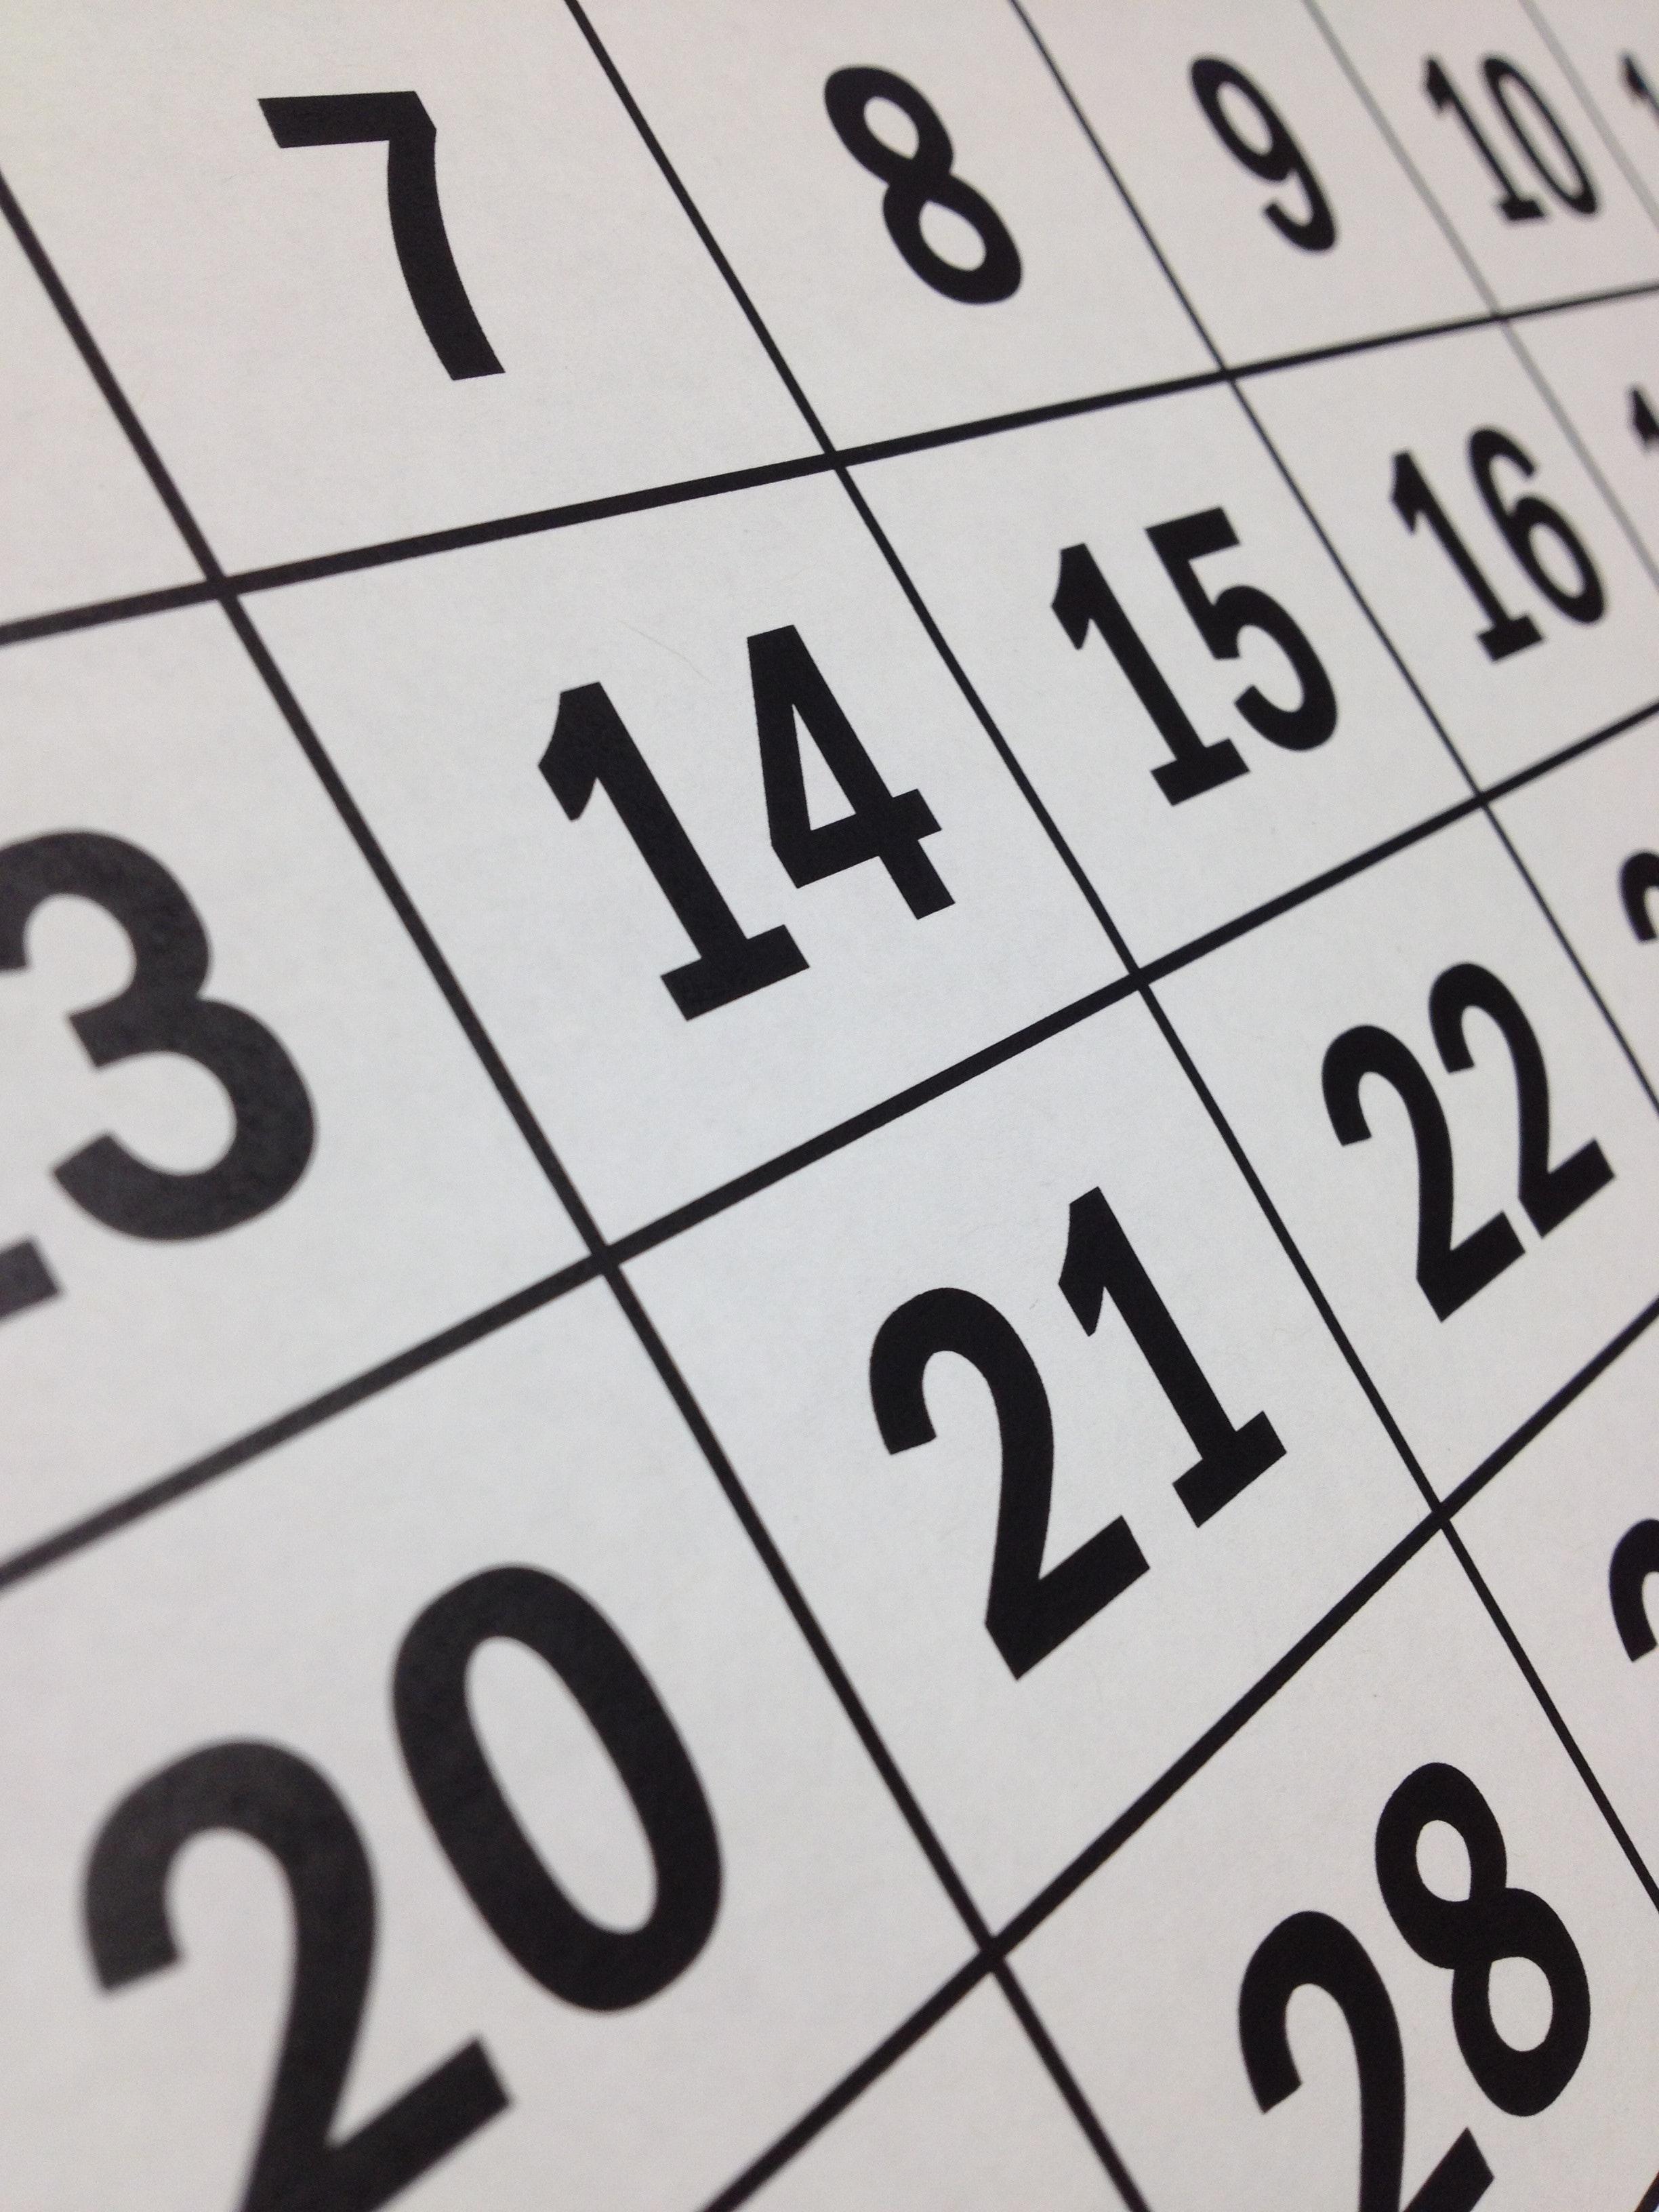 Calendario Conto Alla Rovescia.Foto Gratuita Di Appuntamento Calendario Conto Alla Rovescia